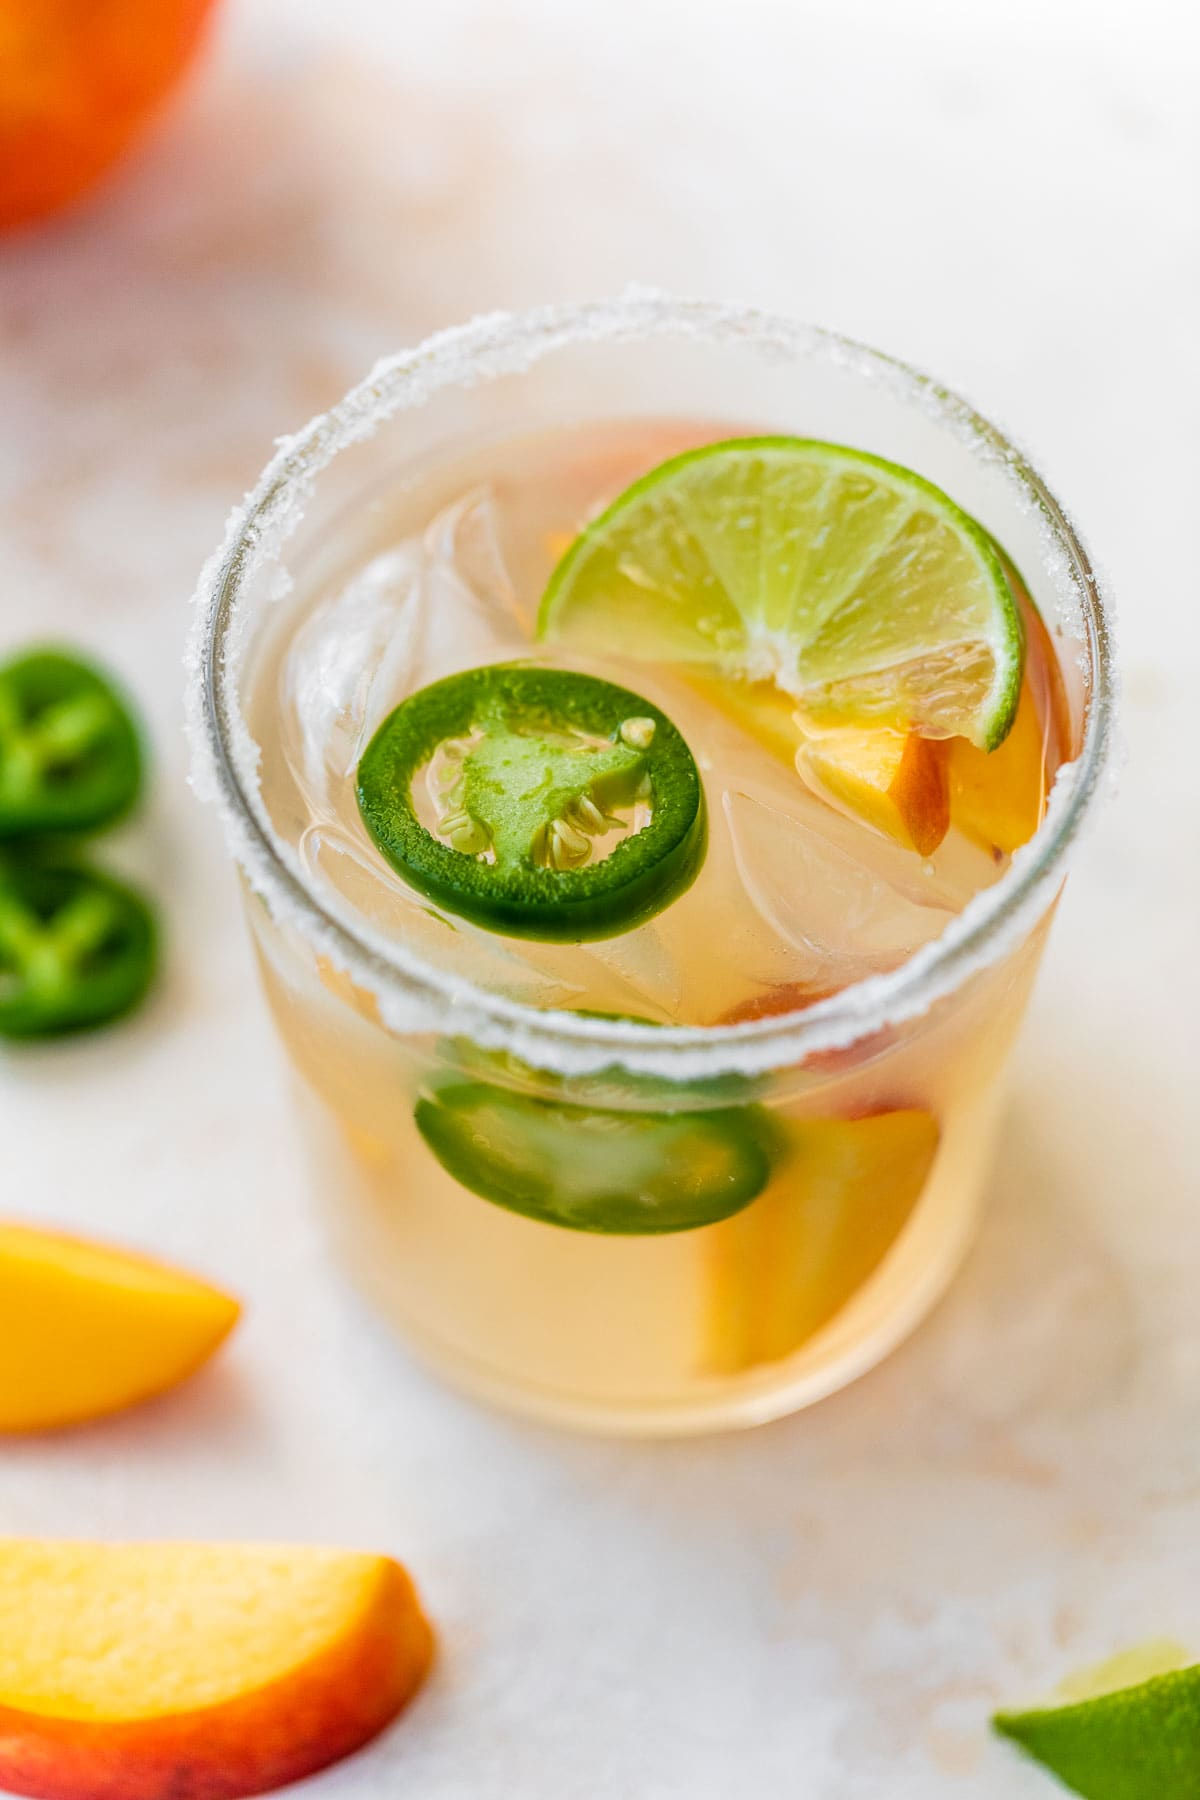 Peach Jalapeno Margaritas-Fresh peach margaritas with jalapeno simple syrup